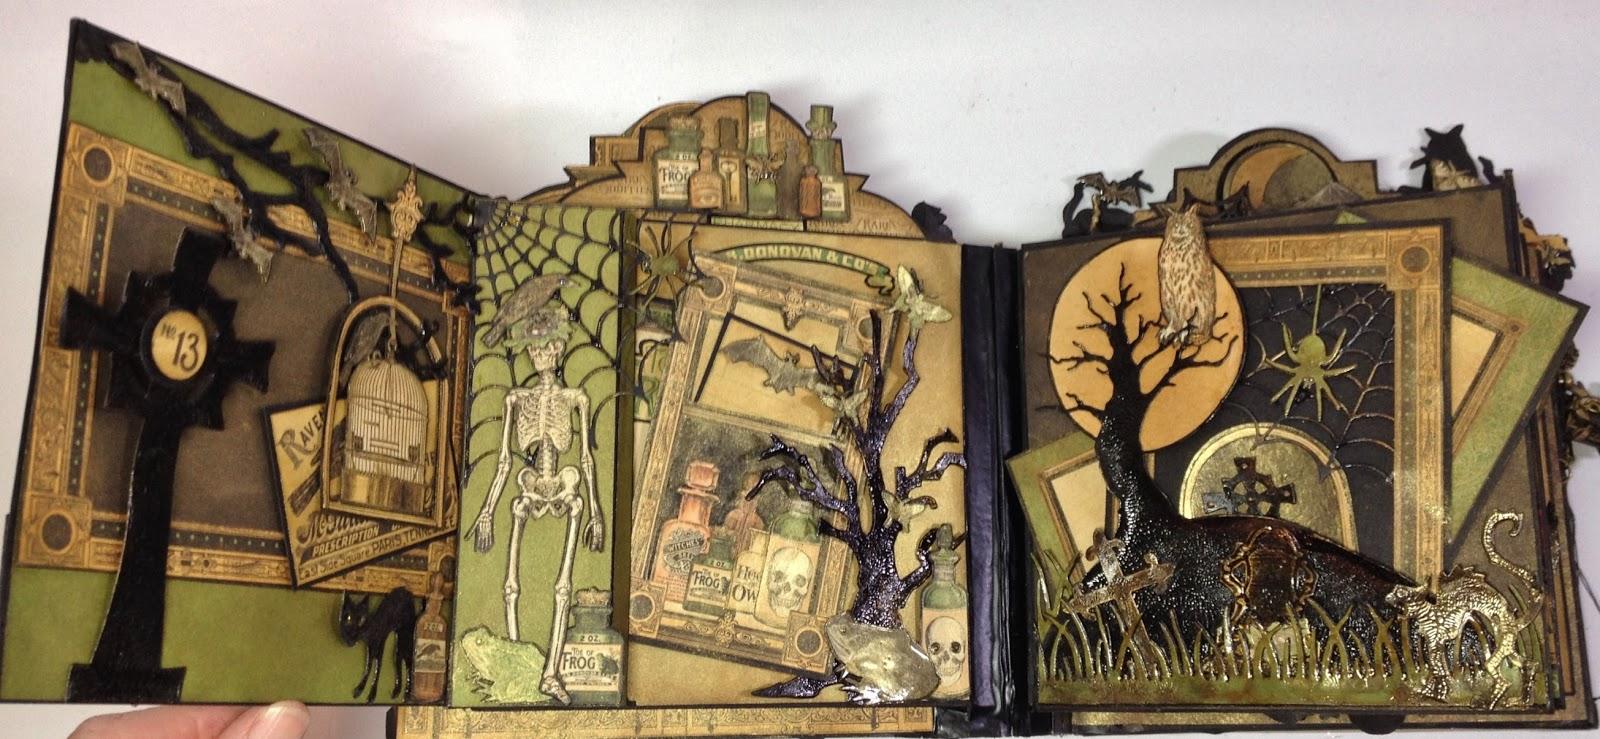 annes papercreations: graphic 45 rare oddities 6x6 page mini album